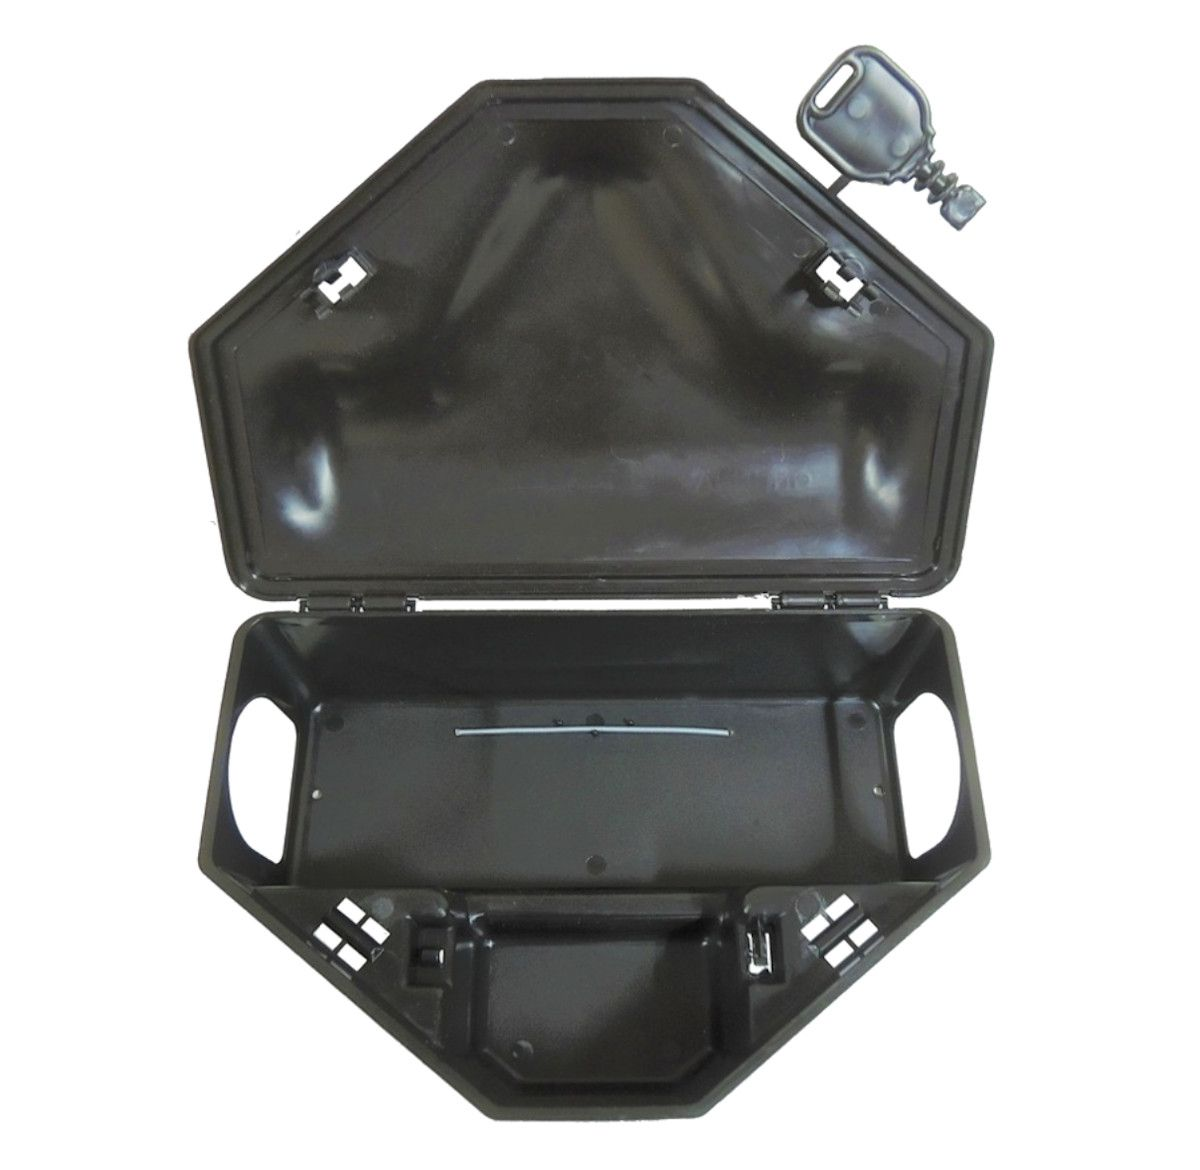 Kit 48 Porta Isca C/2 Chaves + 48 Bloco Extrusado Mata Seca